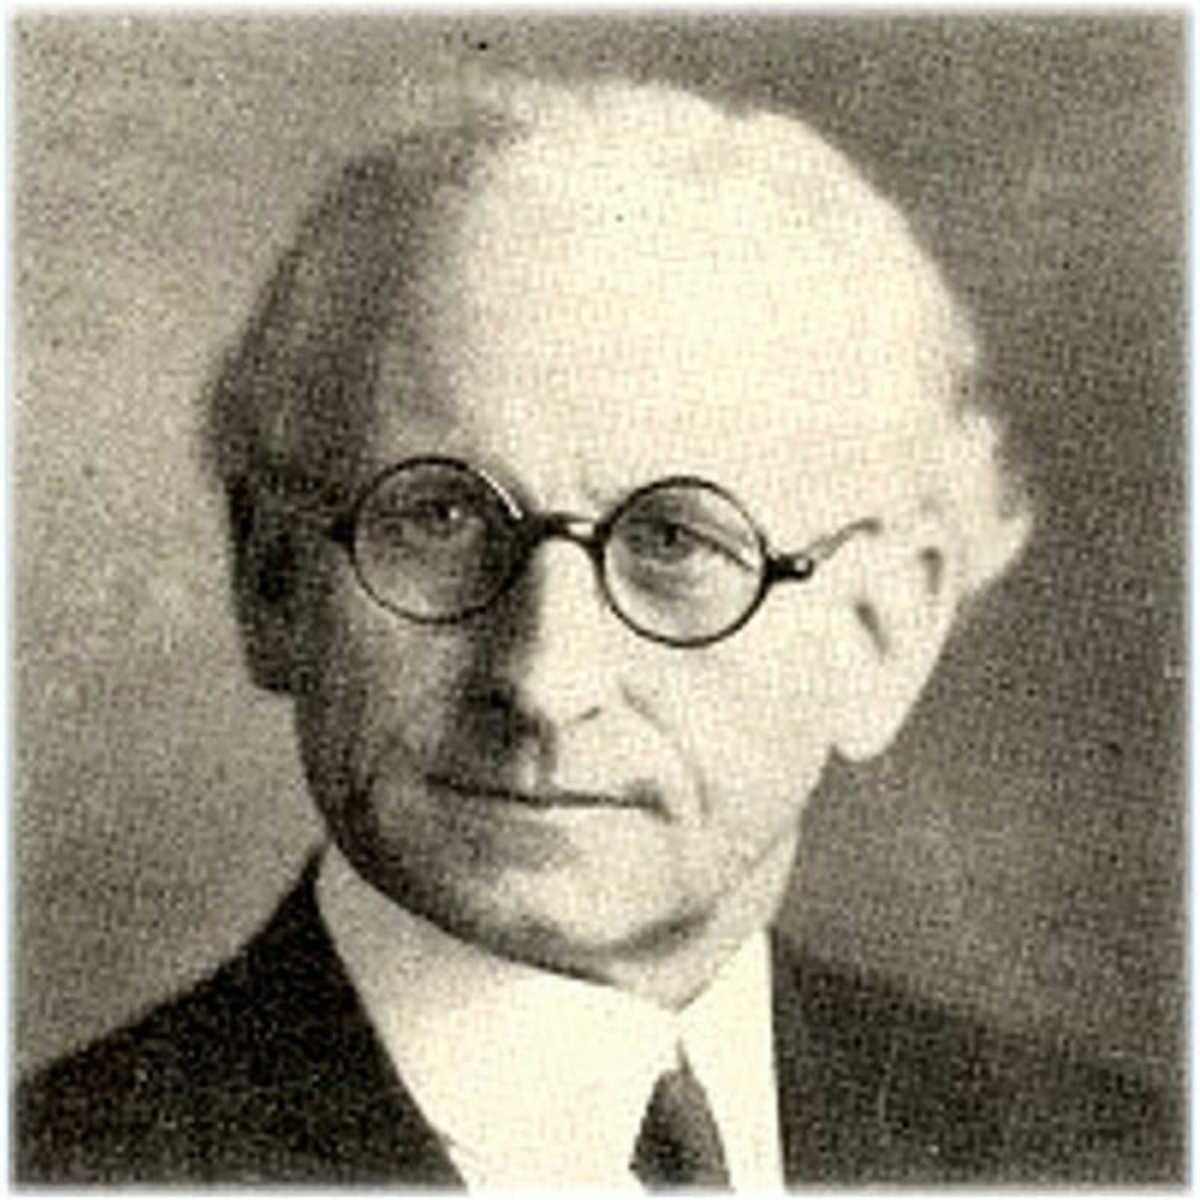 Reverend George Bennard